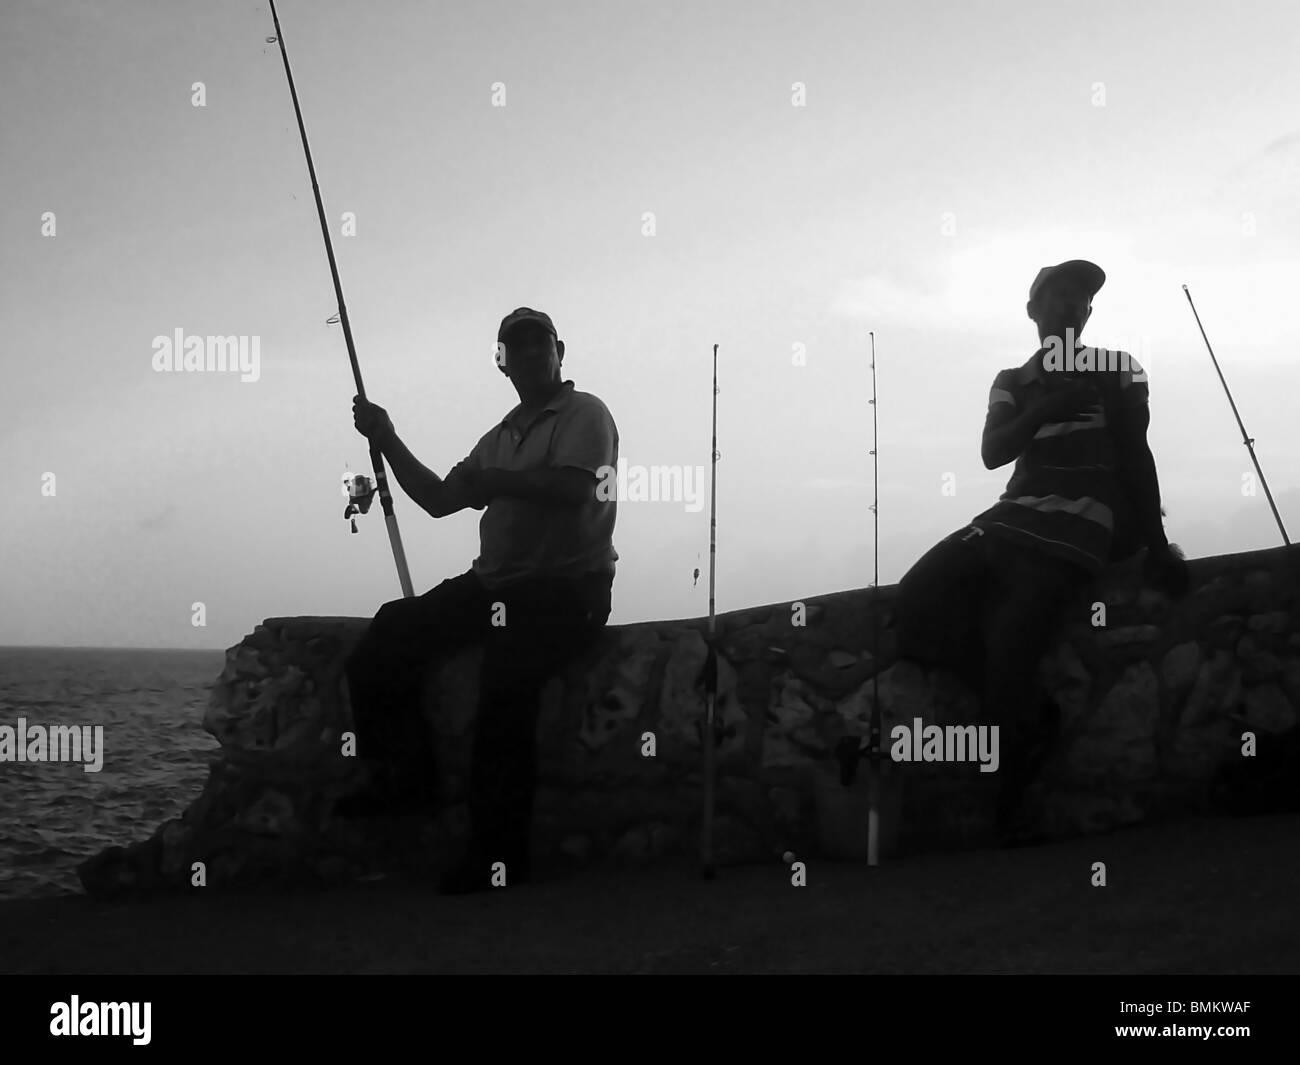 Men fish in the evening from the sea wall in Santo Domingo, Dominican Republic - Stock Image